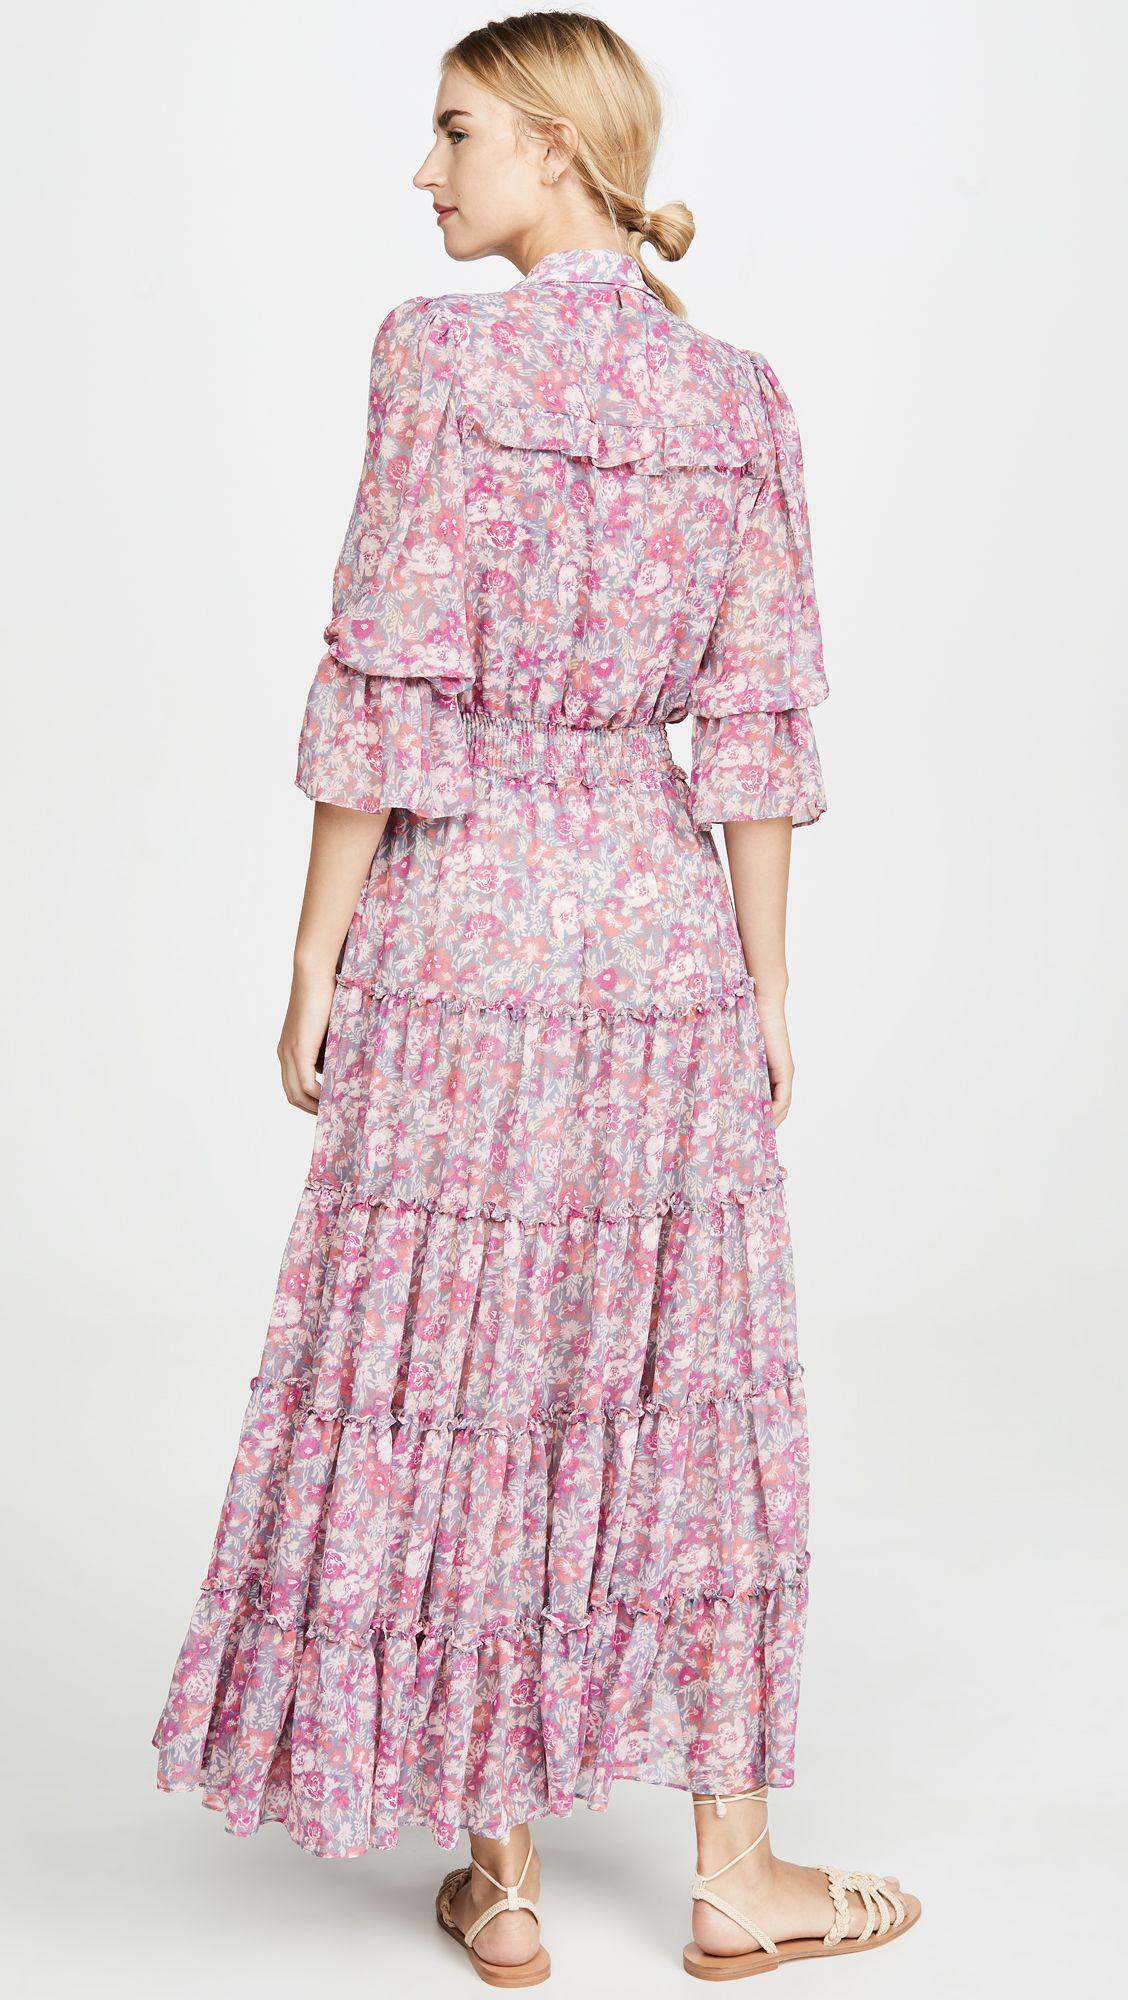 Misa Hermosa Dress Shopbop Dresses Long Sleeve Dress Fashion Outfits